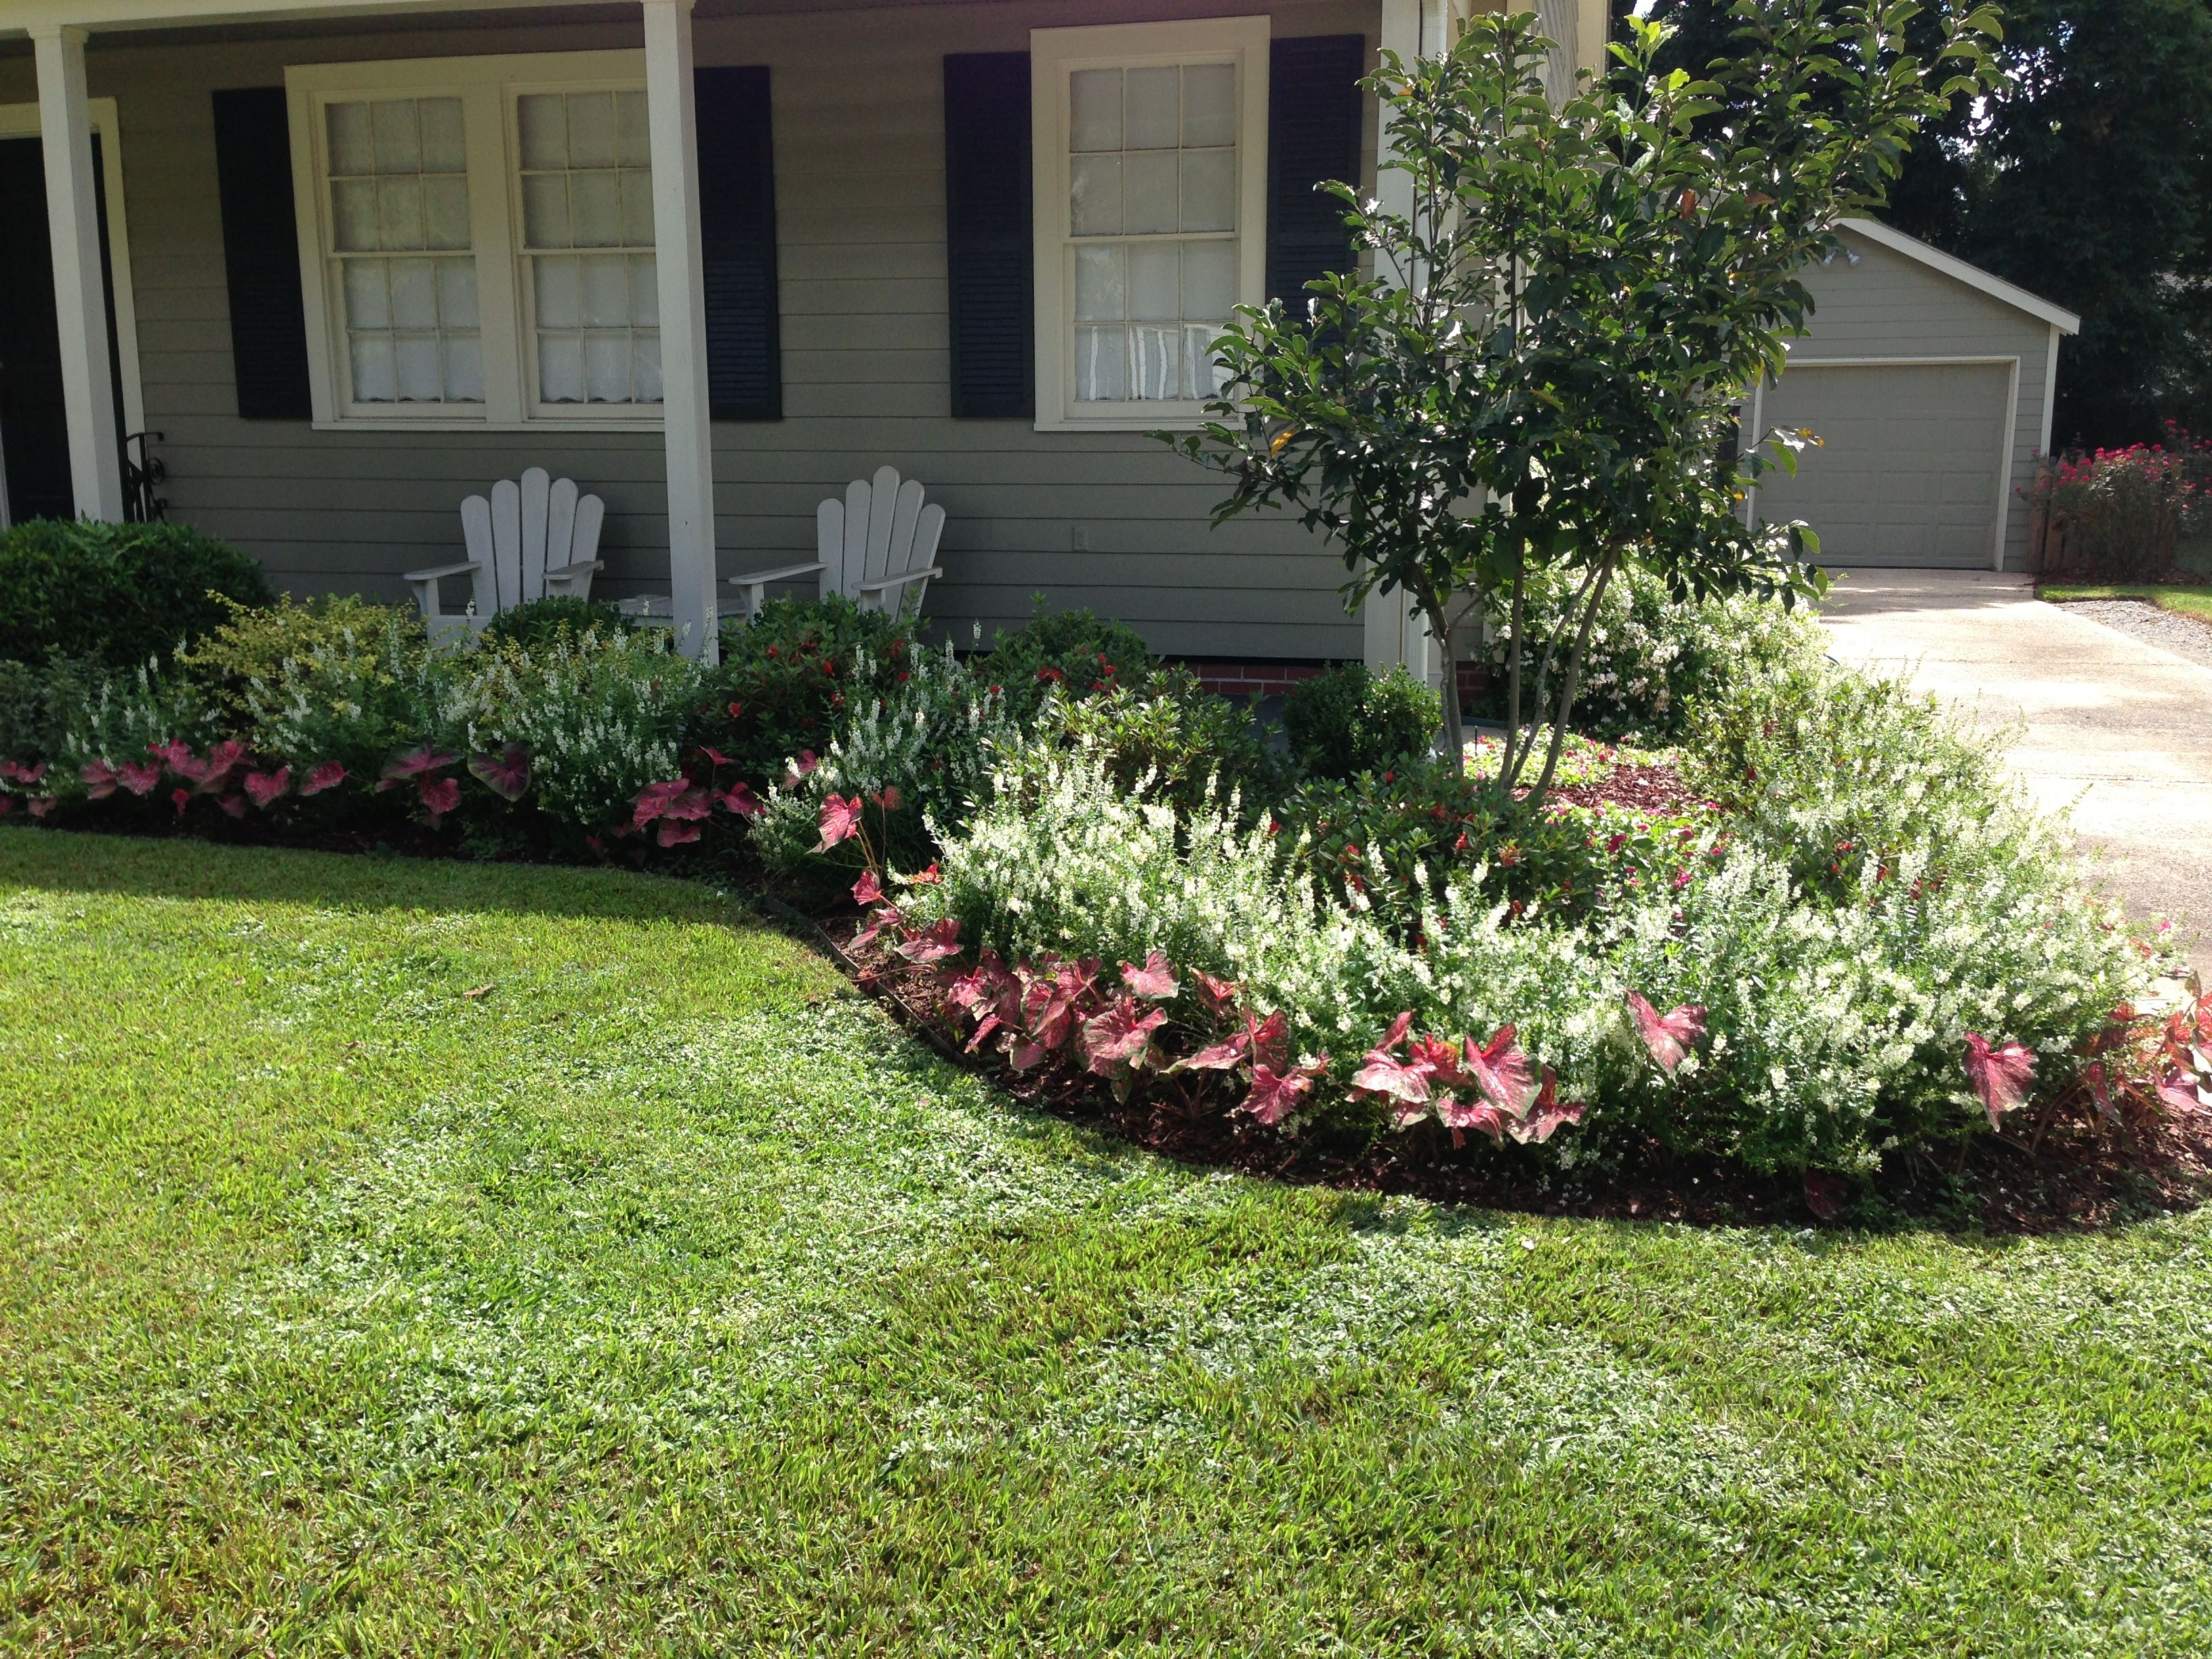 Landscaping Ideas Backyard Garden Beds Front Yard Landscaping